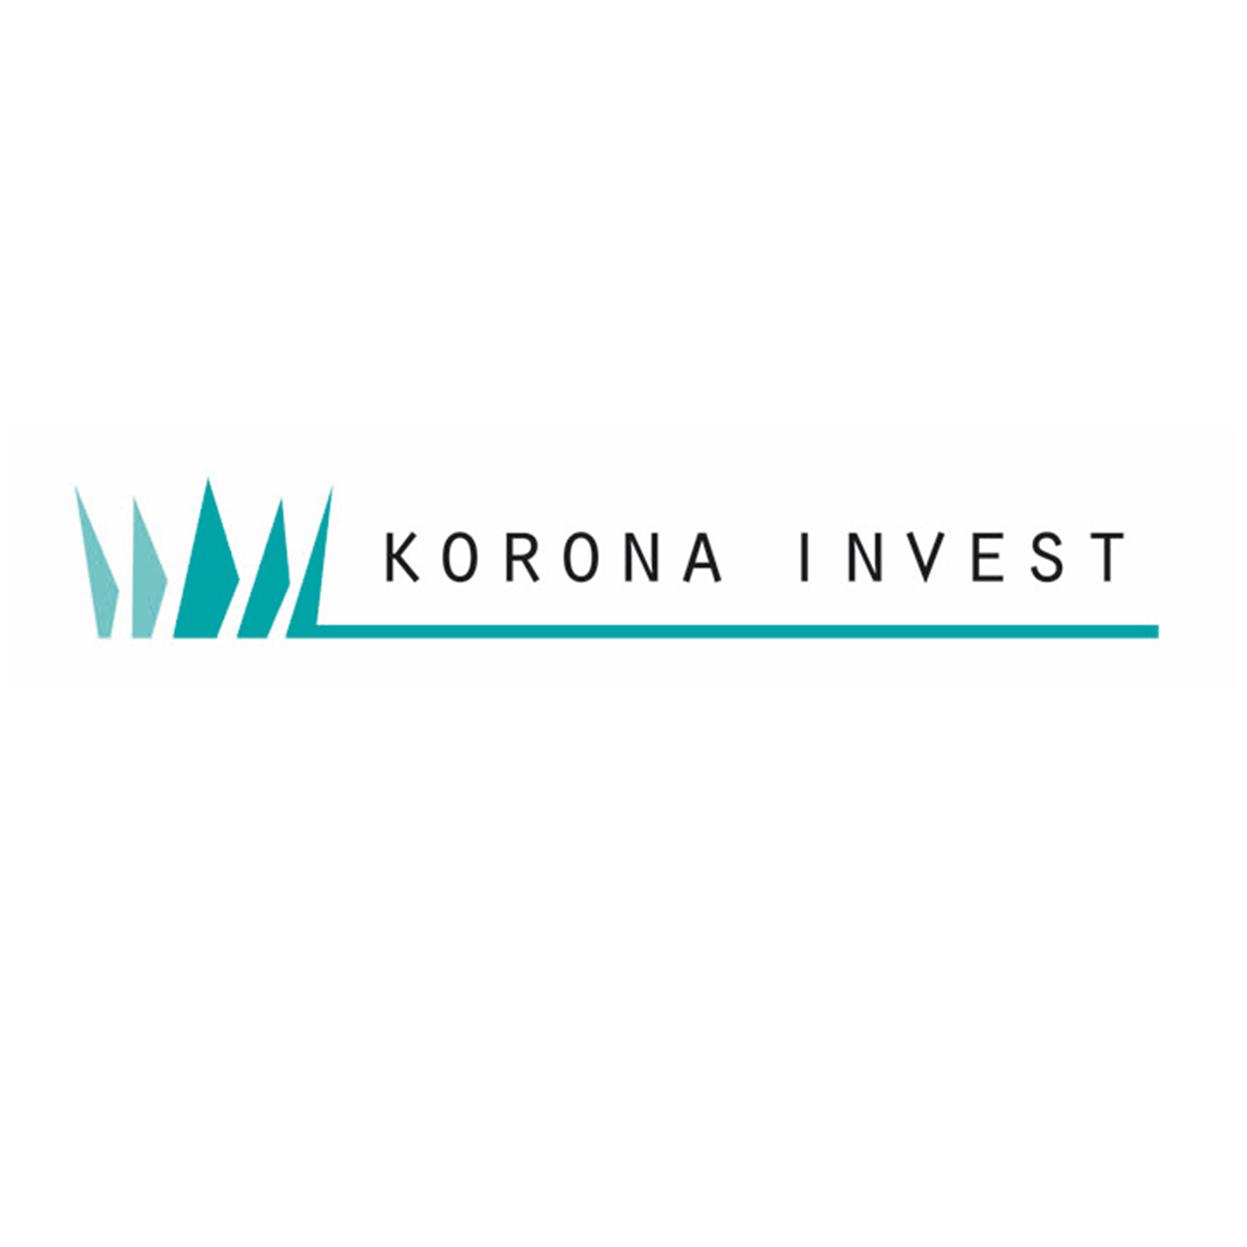 korona-invest-logo